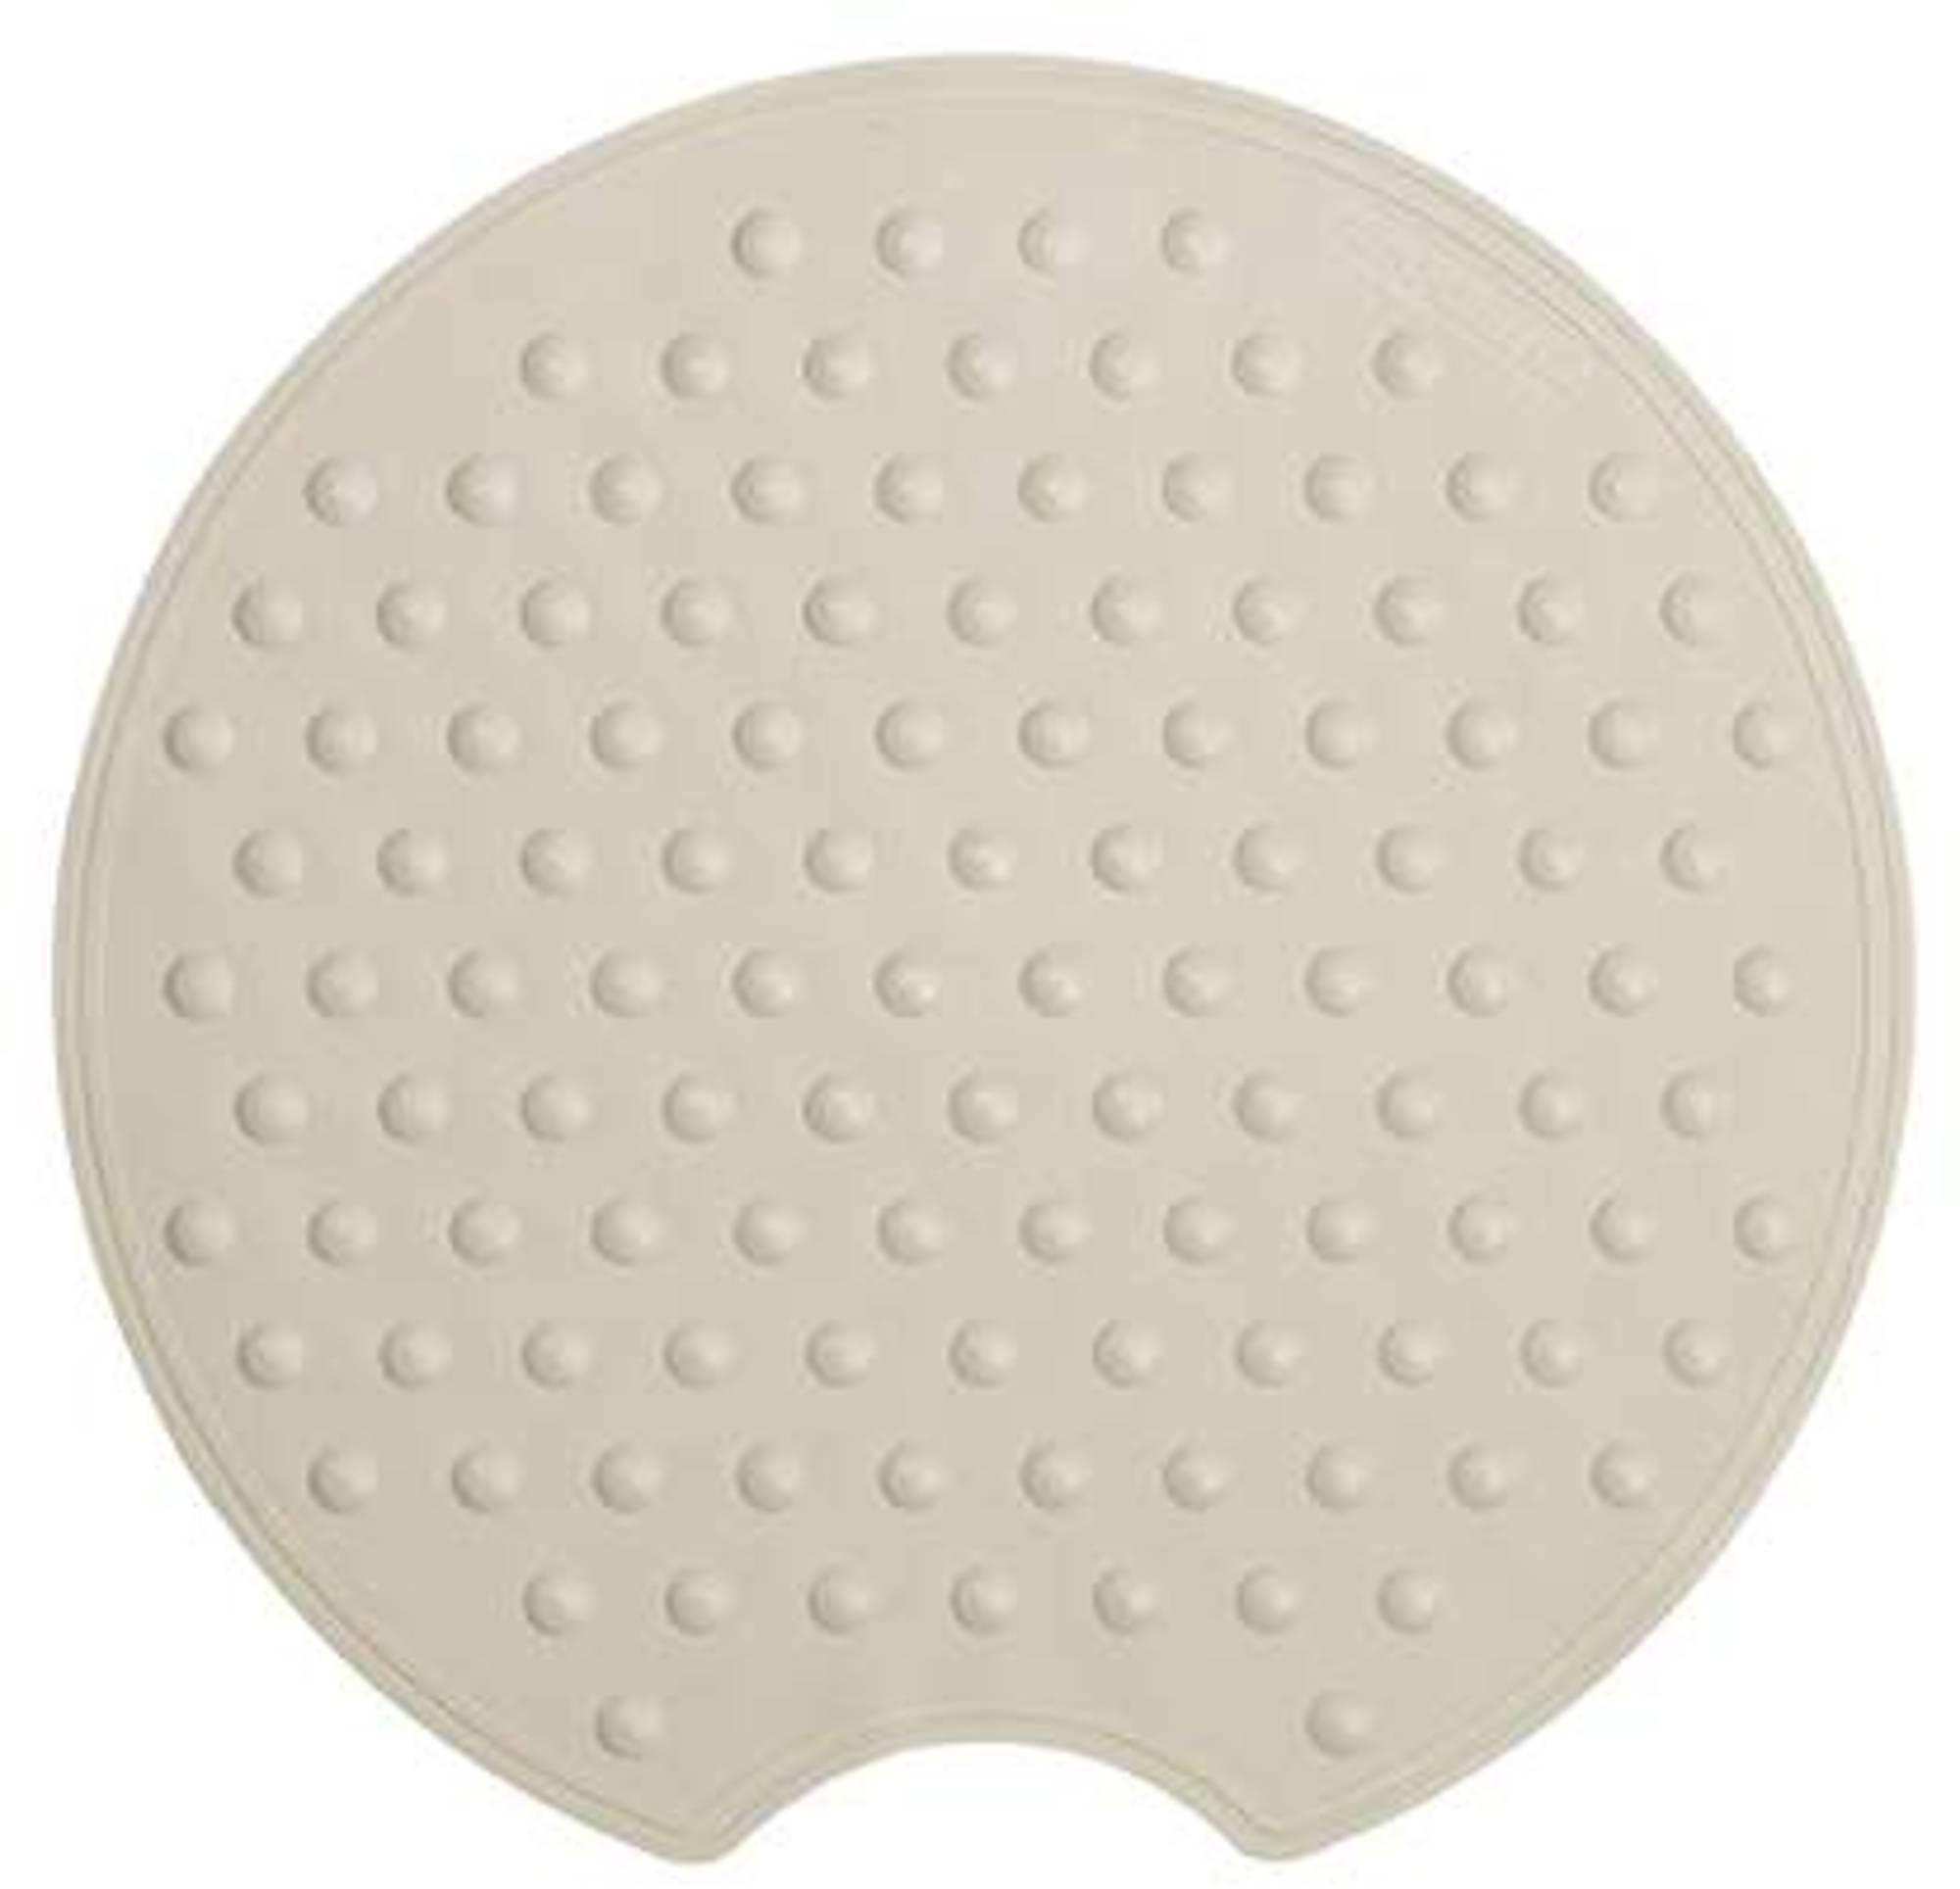 Sealskin Rotondo veiligheidsmat rubber rond ecru